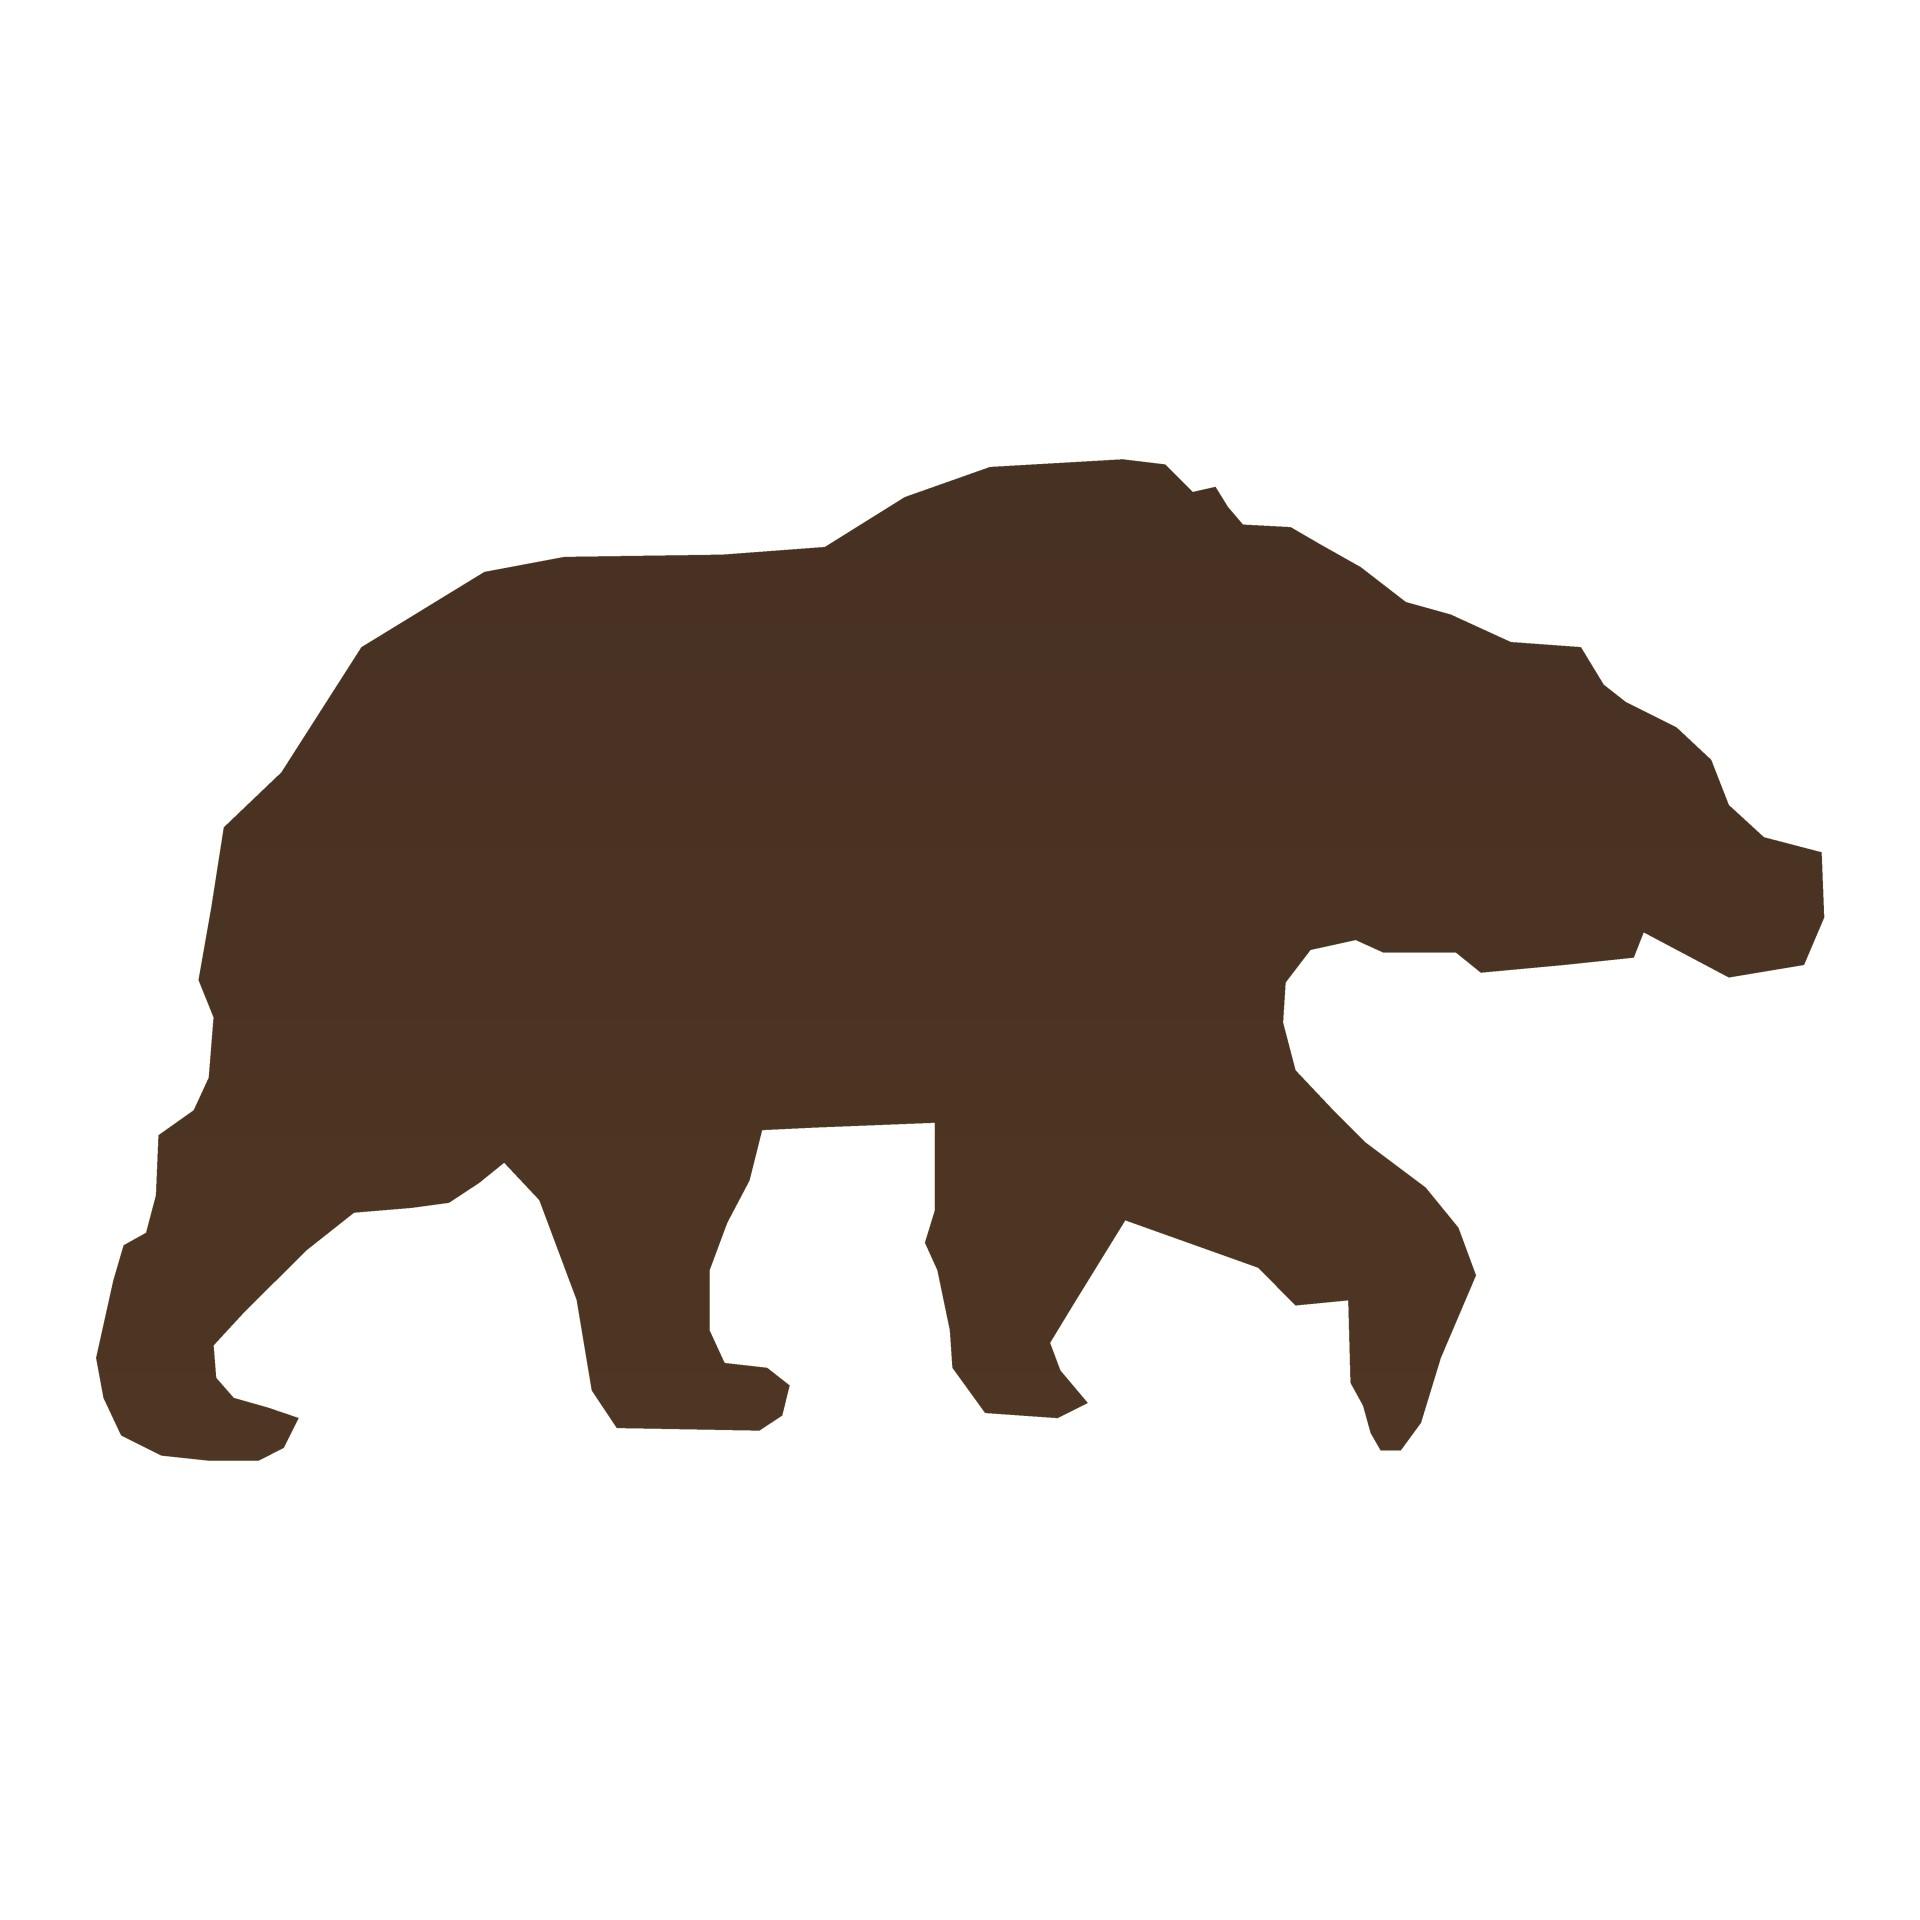 1920x1920 Brown Bear Silhouette Free Stock Photo